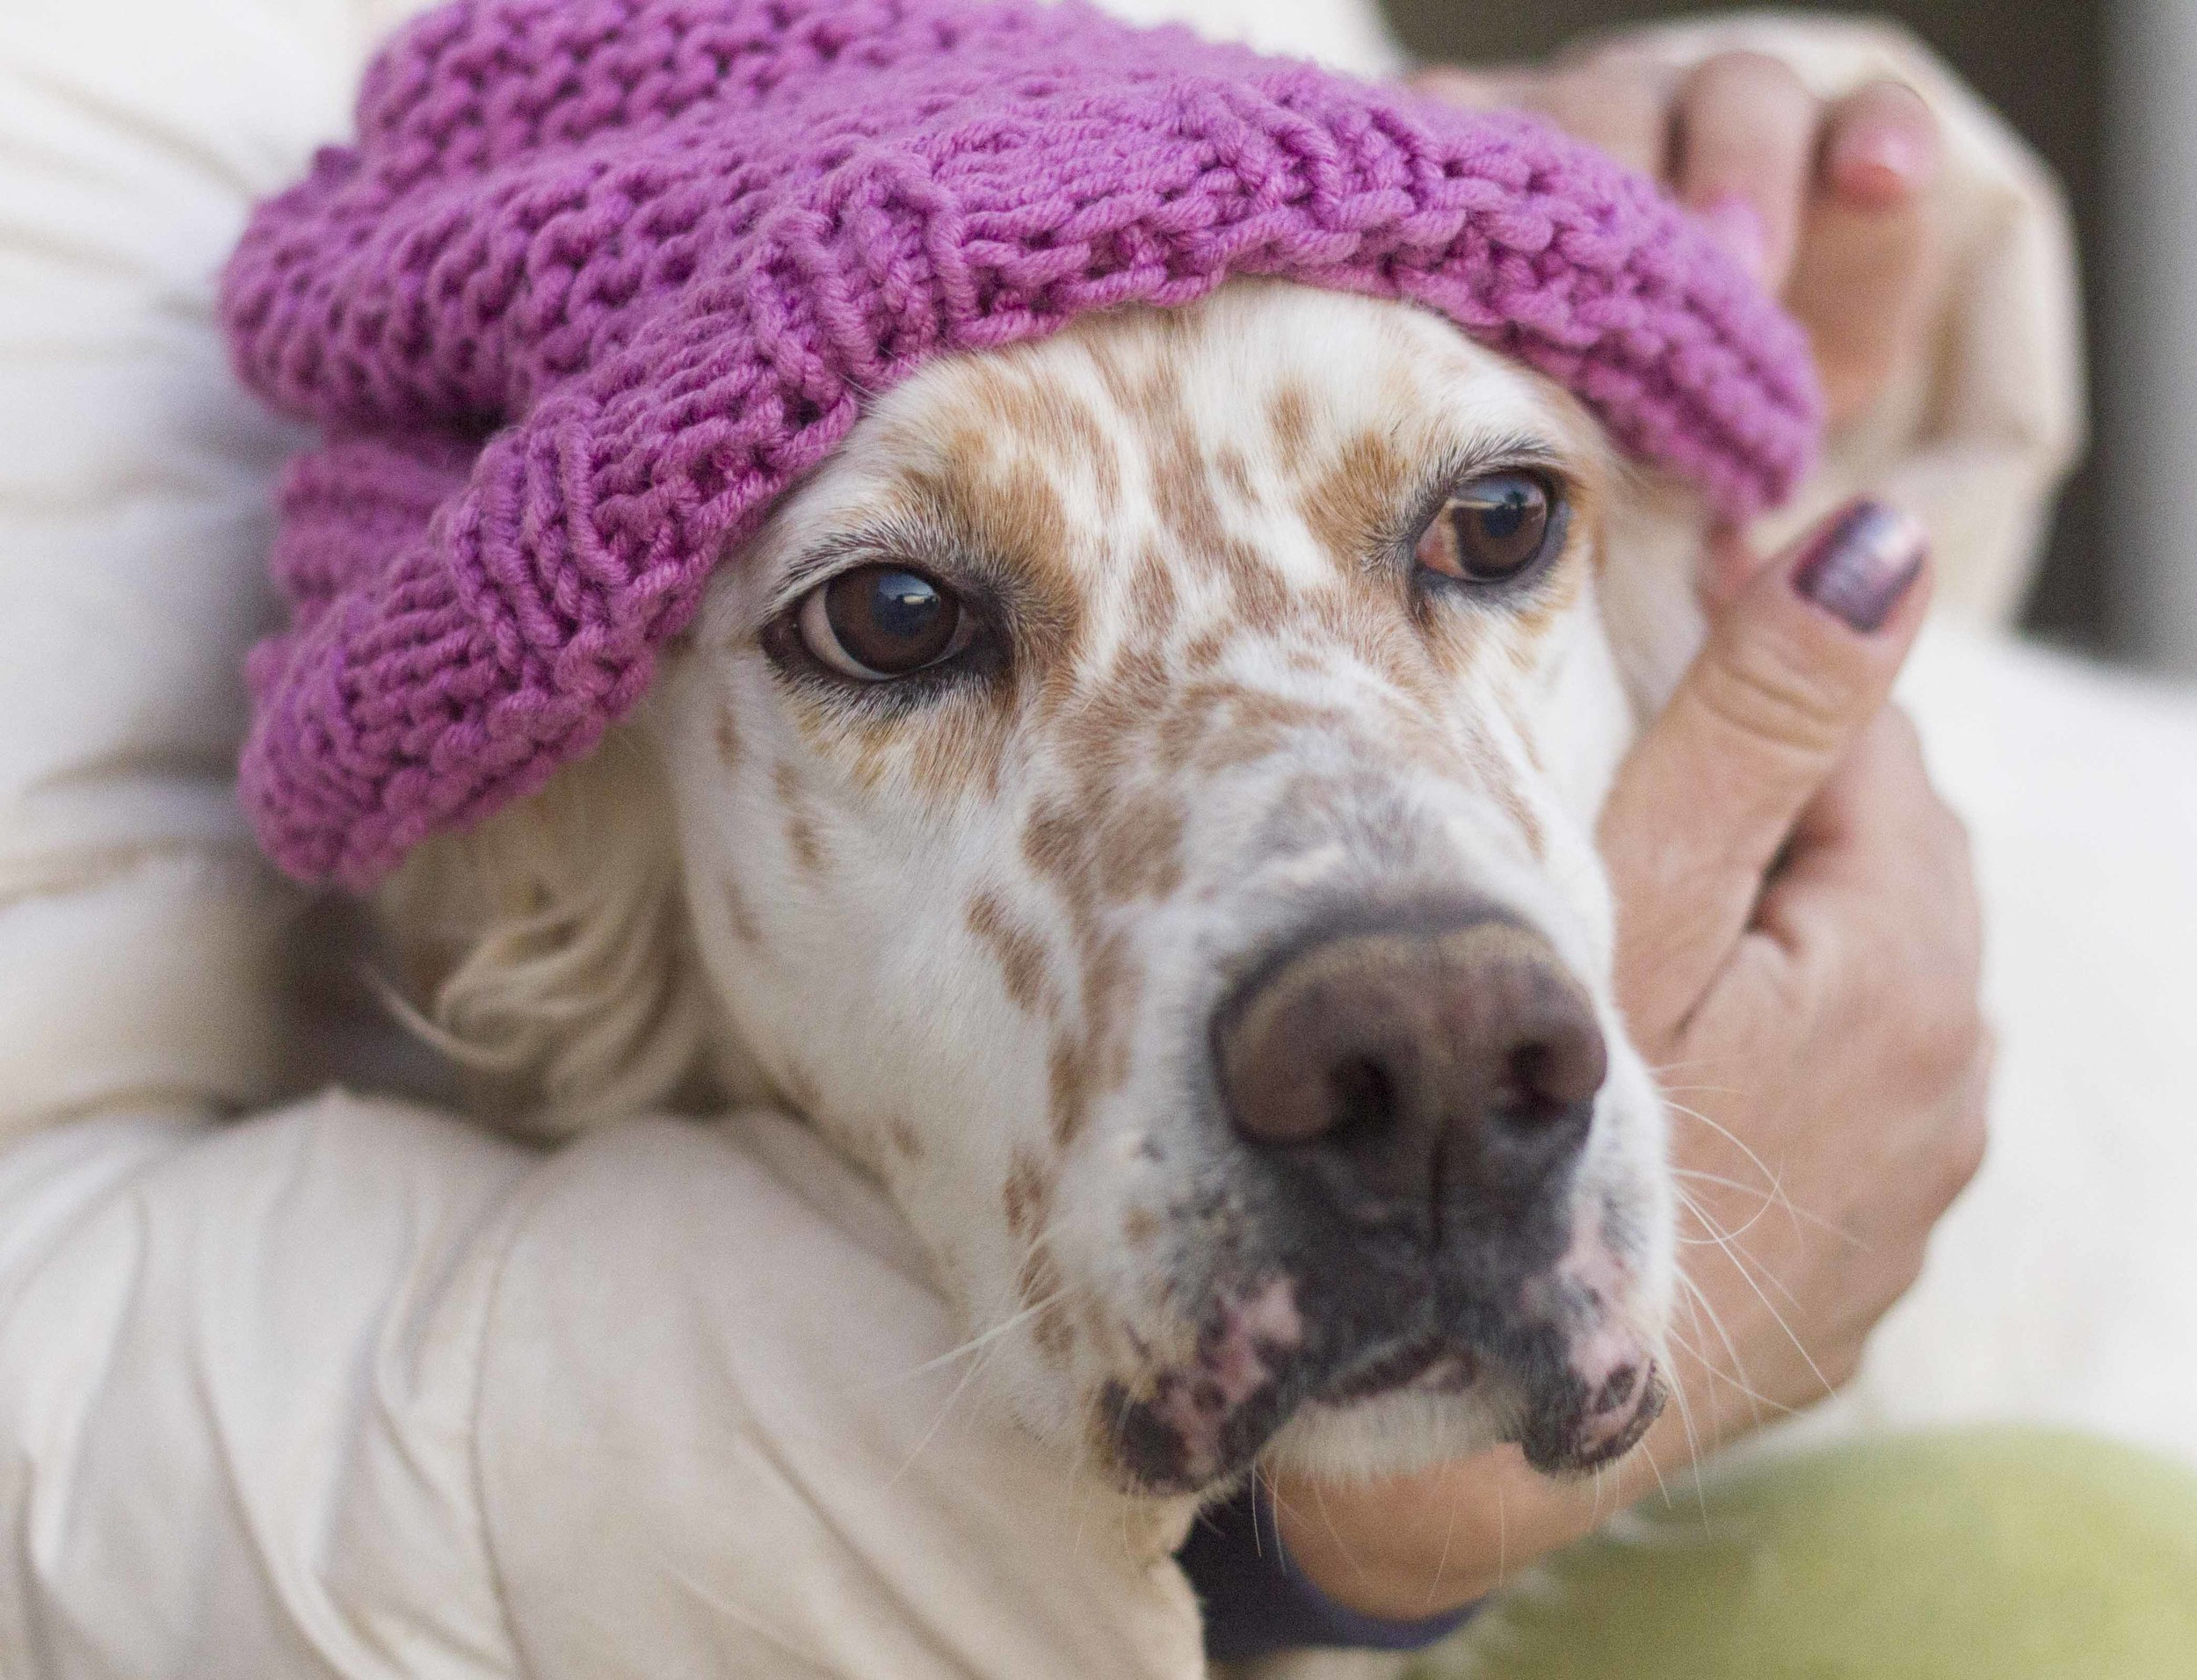 Rex English setter | Mykonos dog rescue and adoption | Luca Pisaroni and Cate PisaroniRex English setter | Mykonos dog rescue and adoption | Luca Pisaroni and Cate Pisaroni